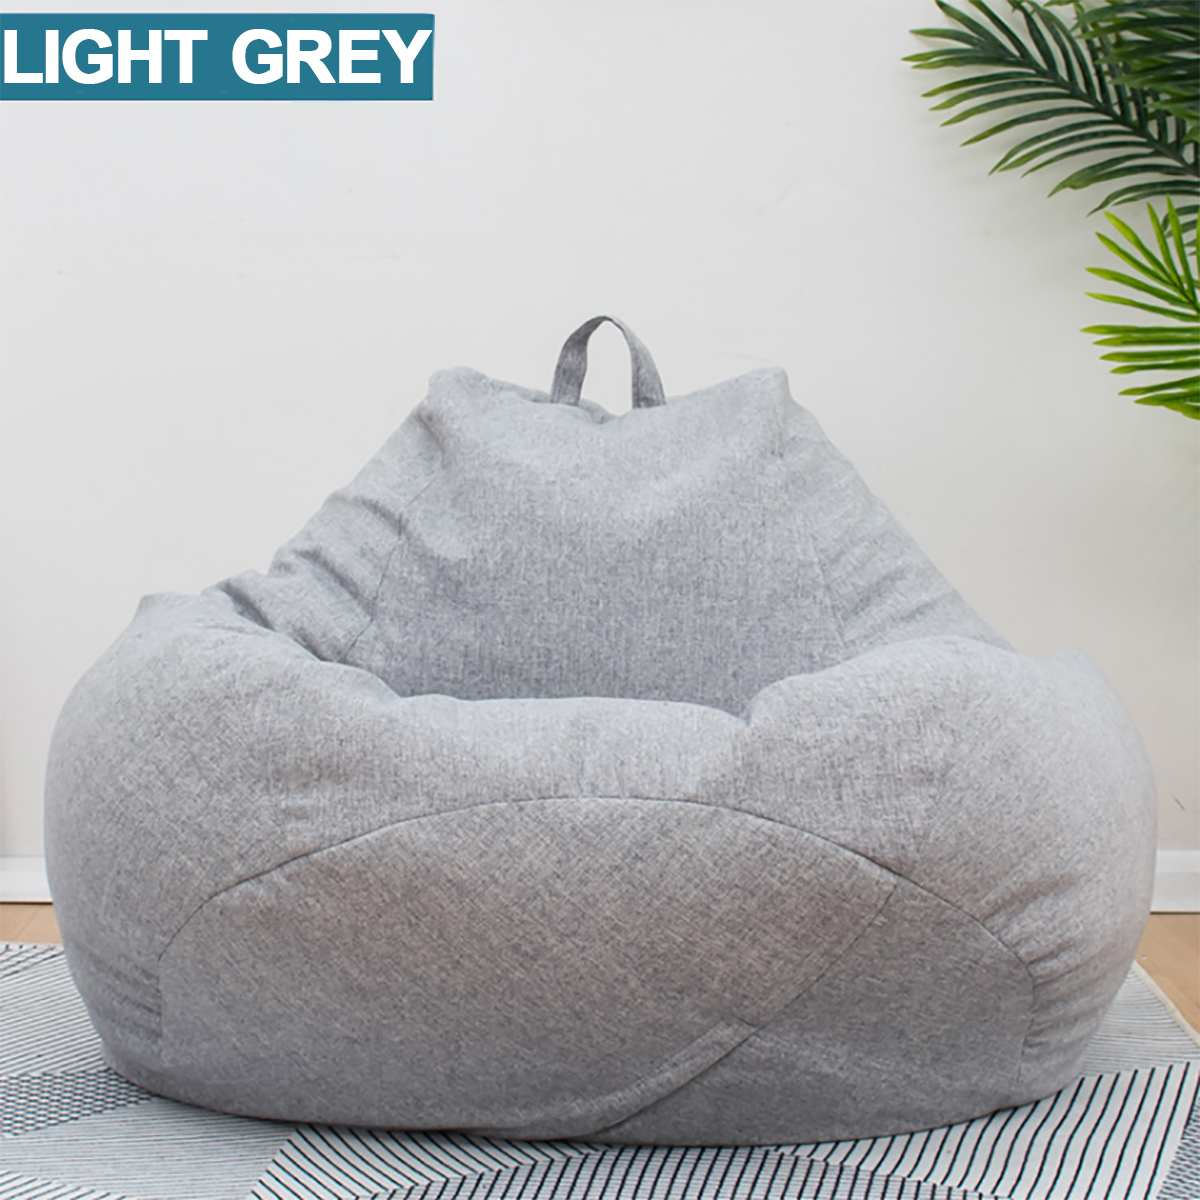 Furniture - Comfortable Soft Giant Bean Bag Chair